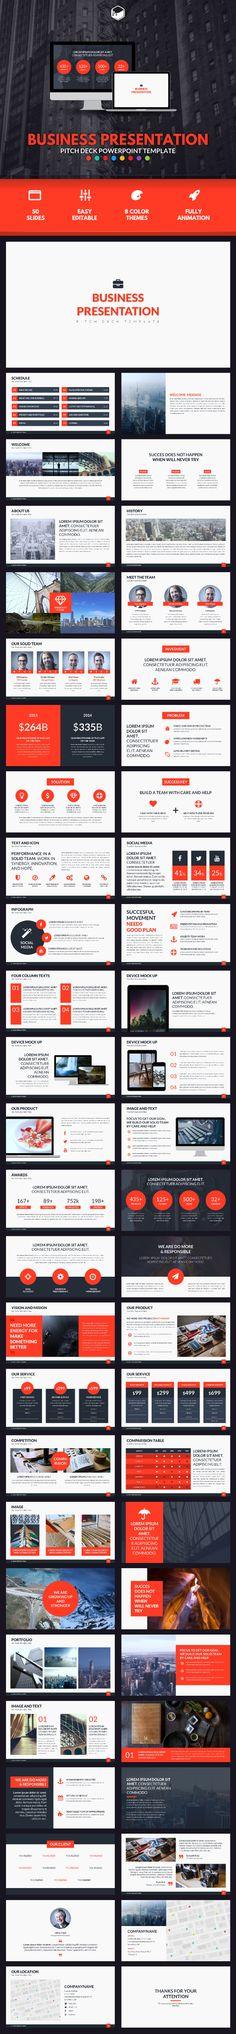 Business Presentation - PitchDeck PowerPoint Template #design #slides Download: http://graphicriver.net/item/business-presentation-pitchdeck-powerpoint-template/14376069?ref=ksioks